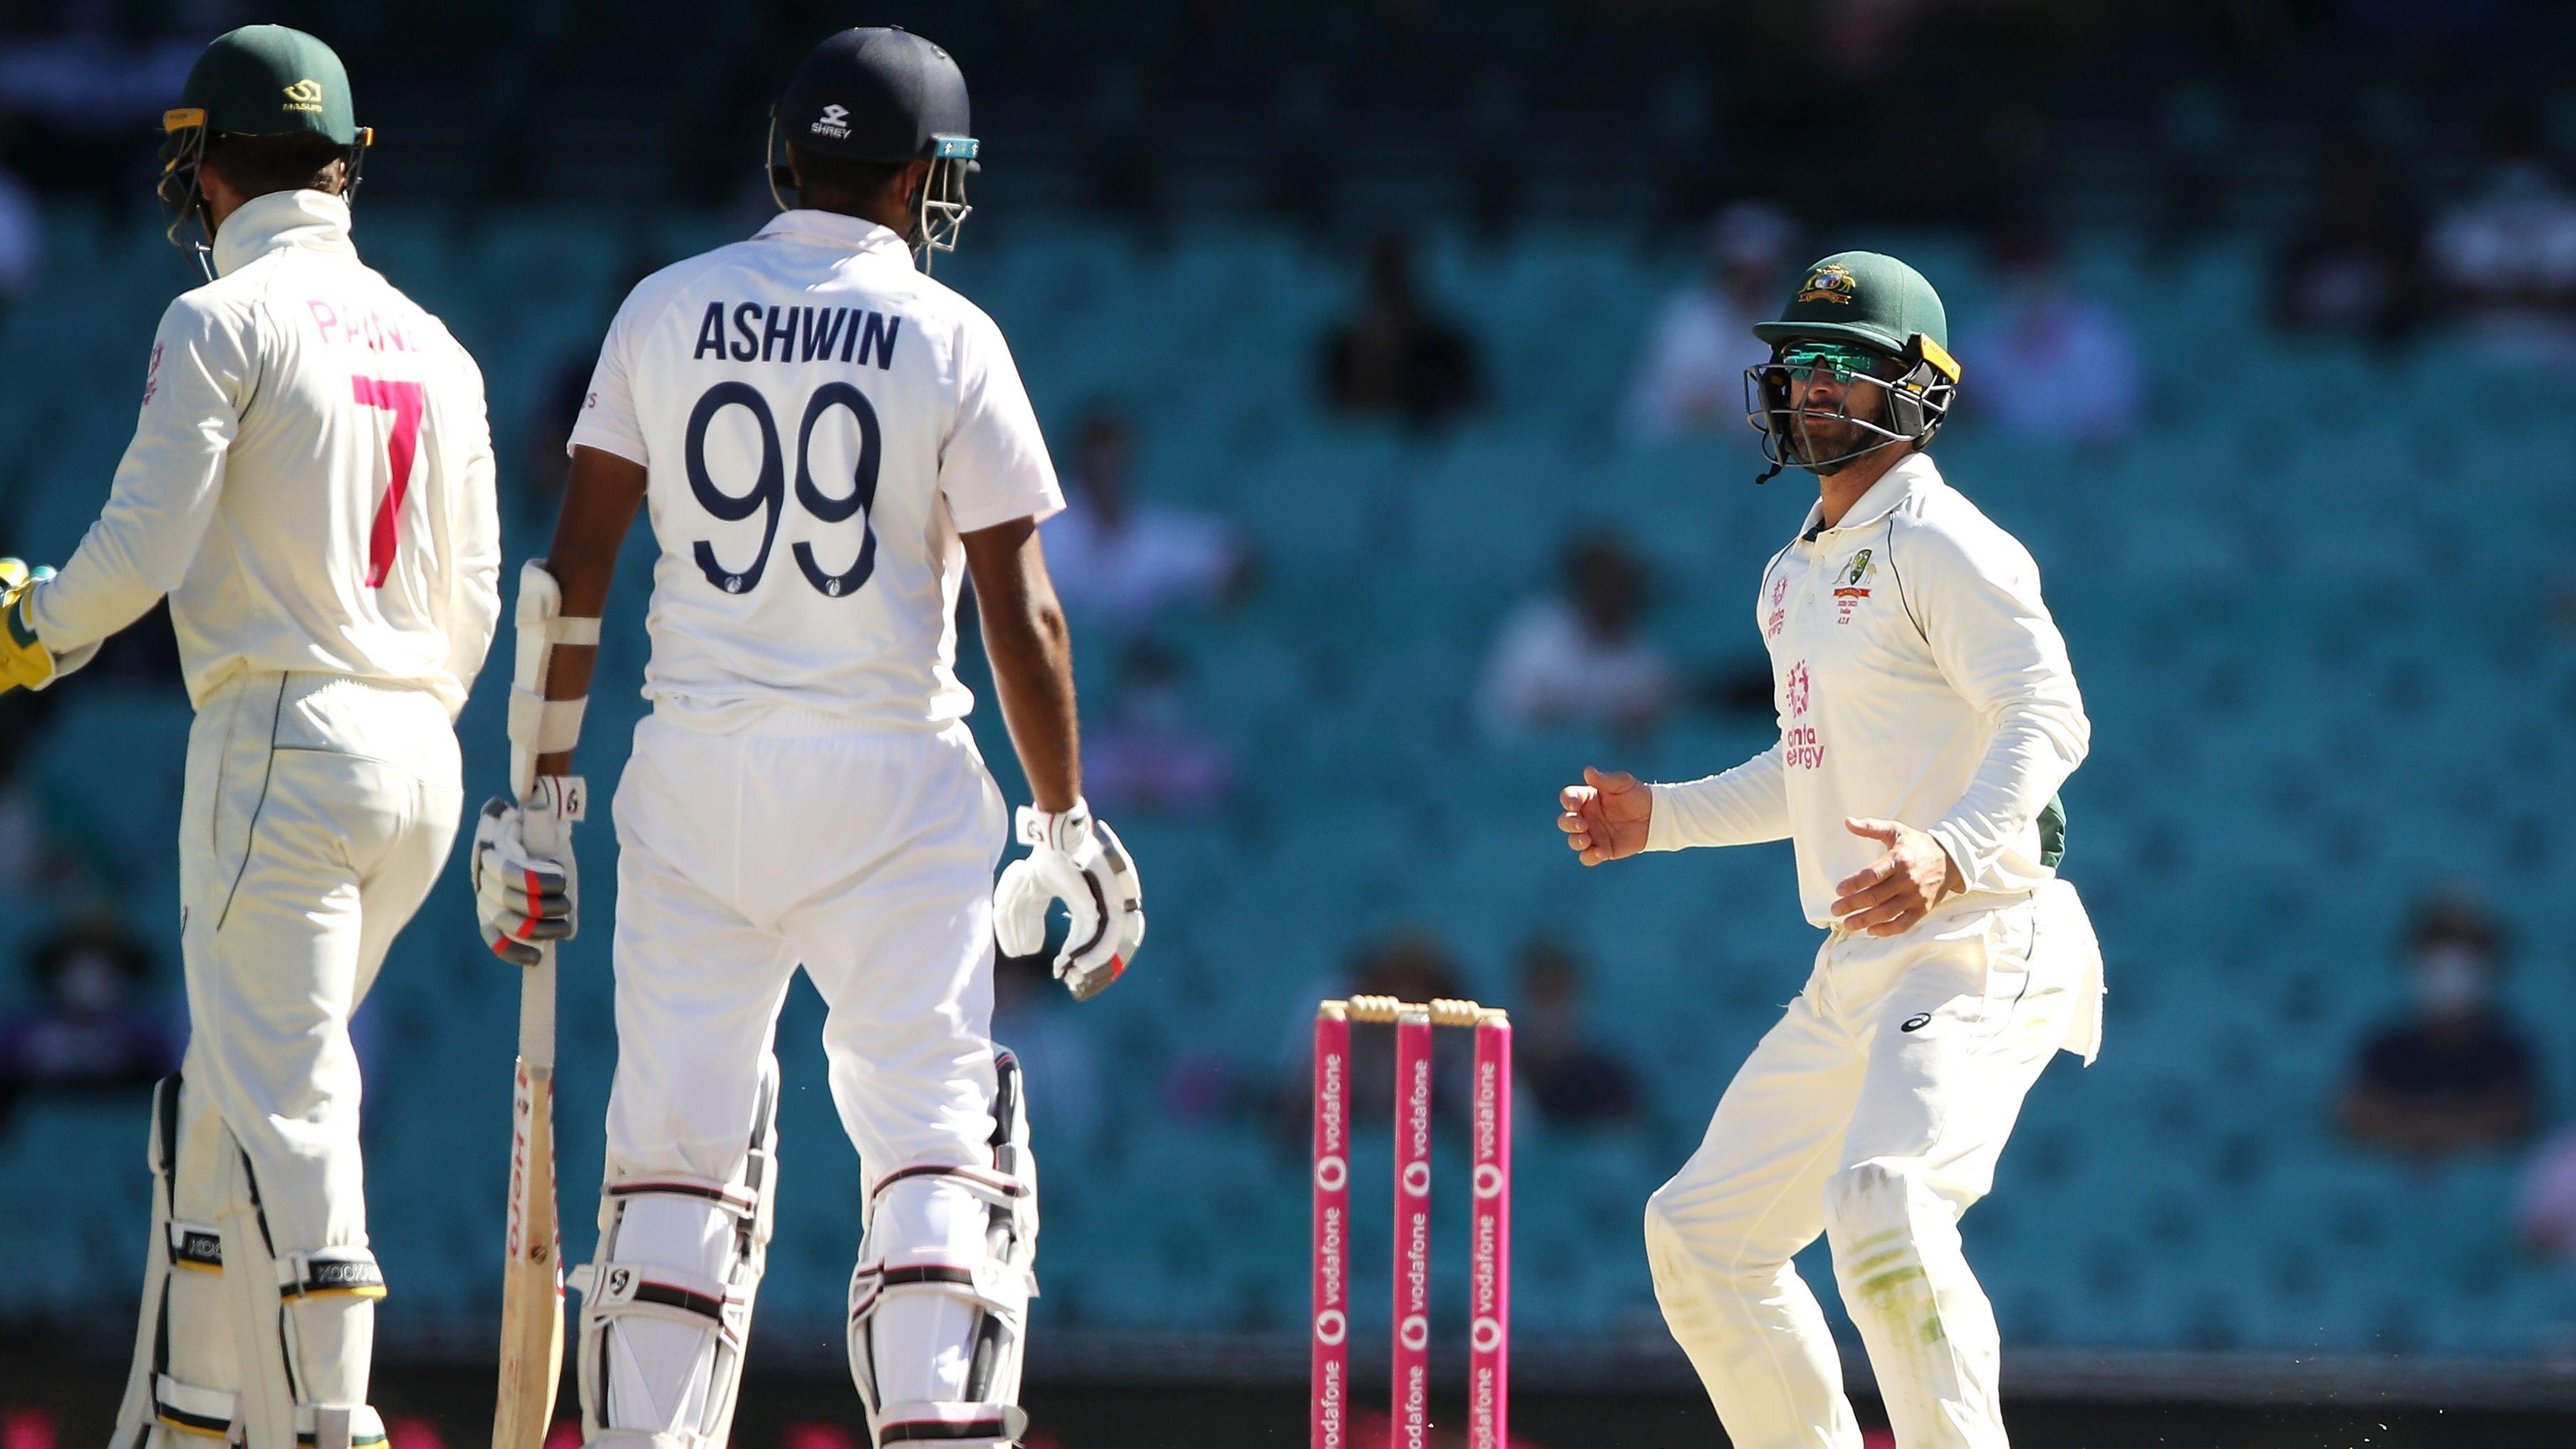 Mark Reason: Australia's cricket team loses honour in shameful short bowling assault on India